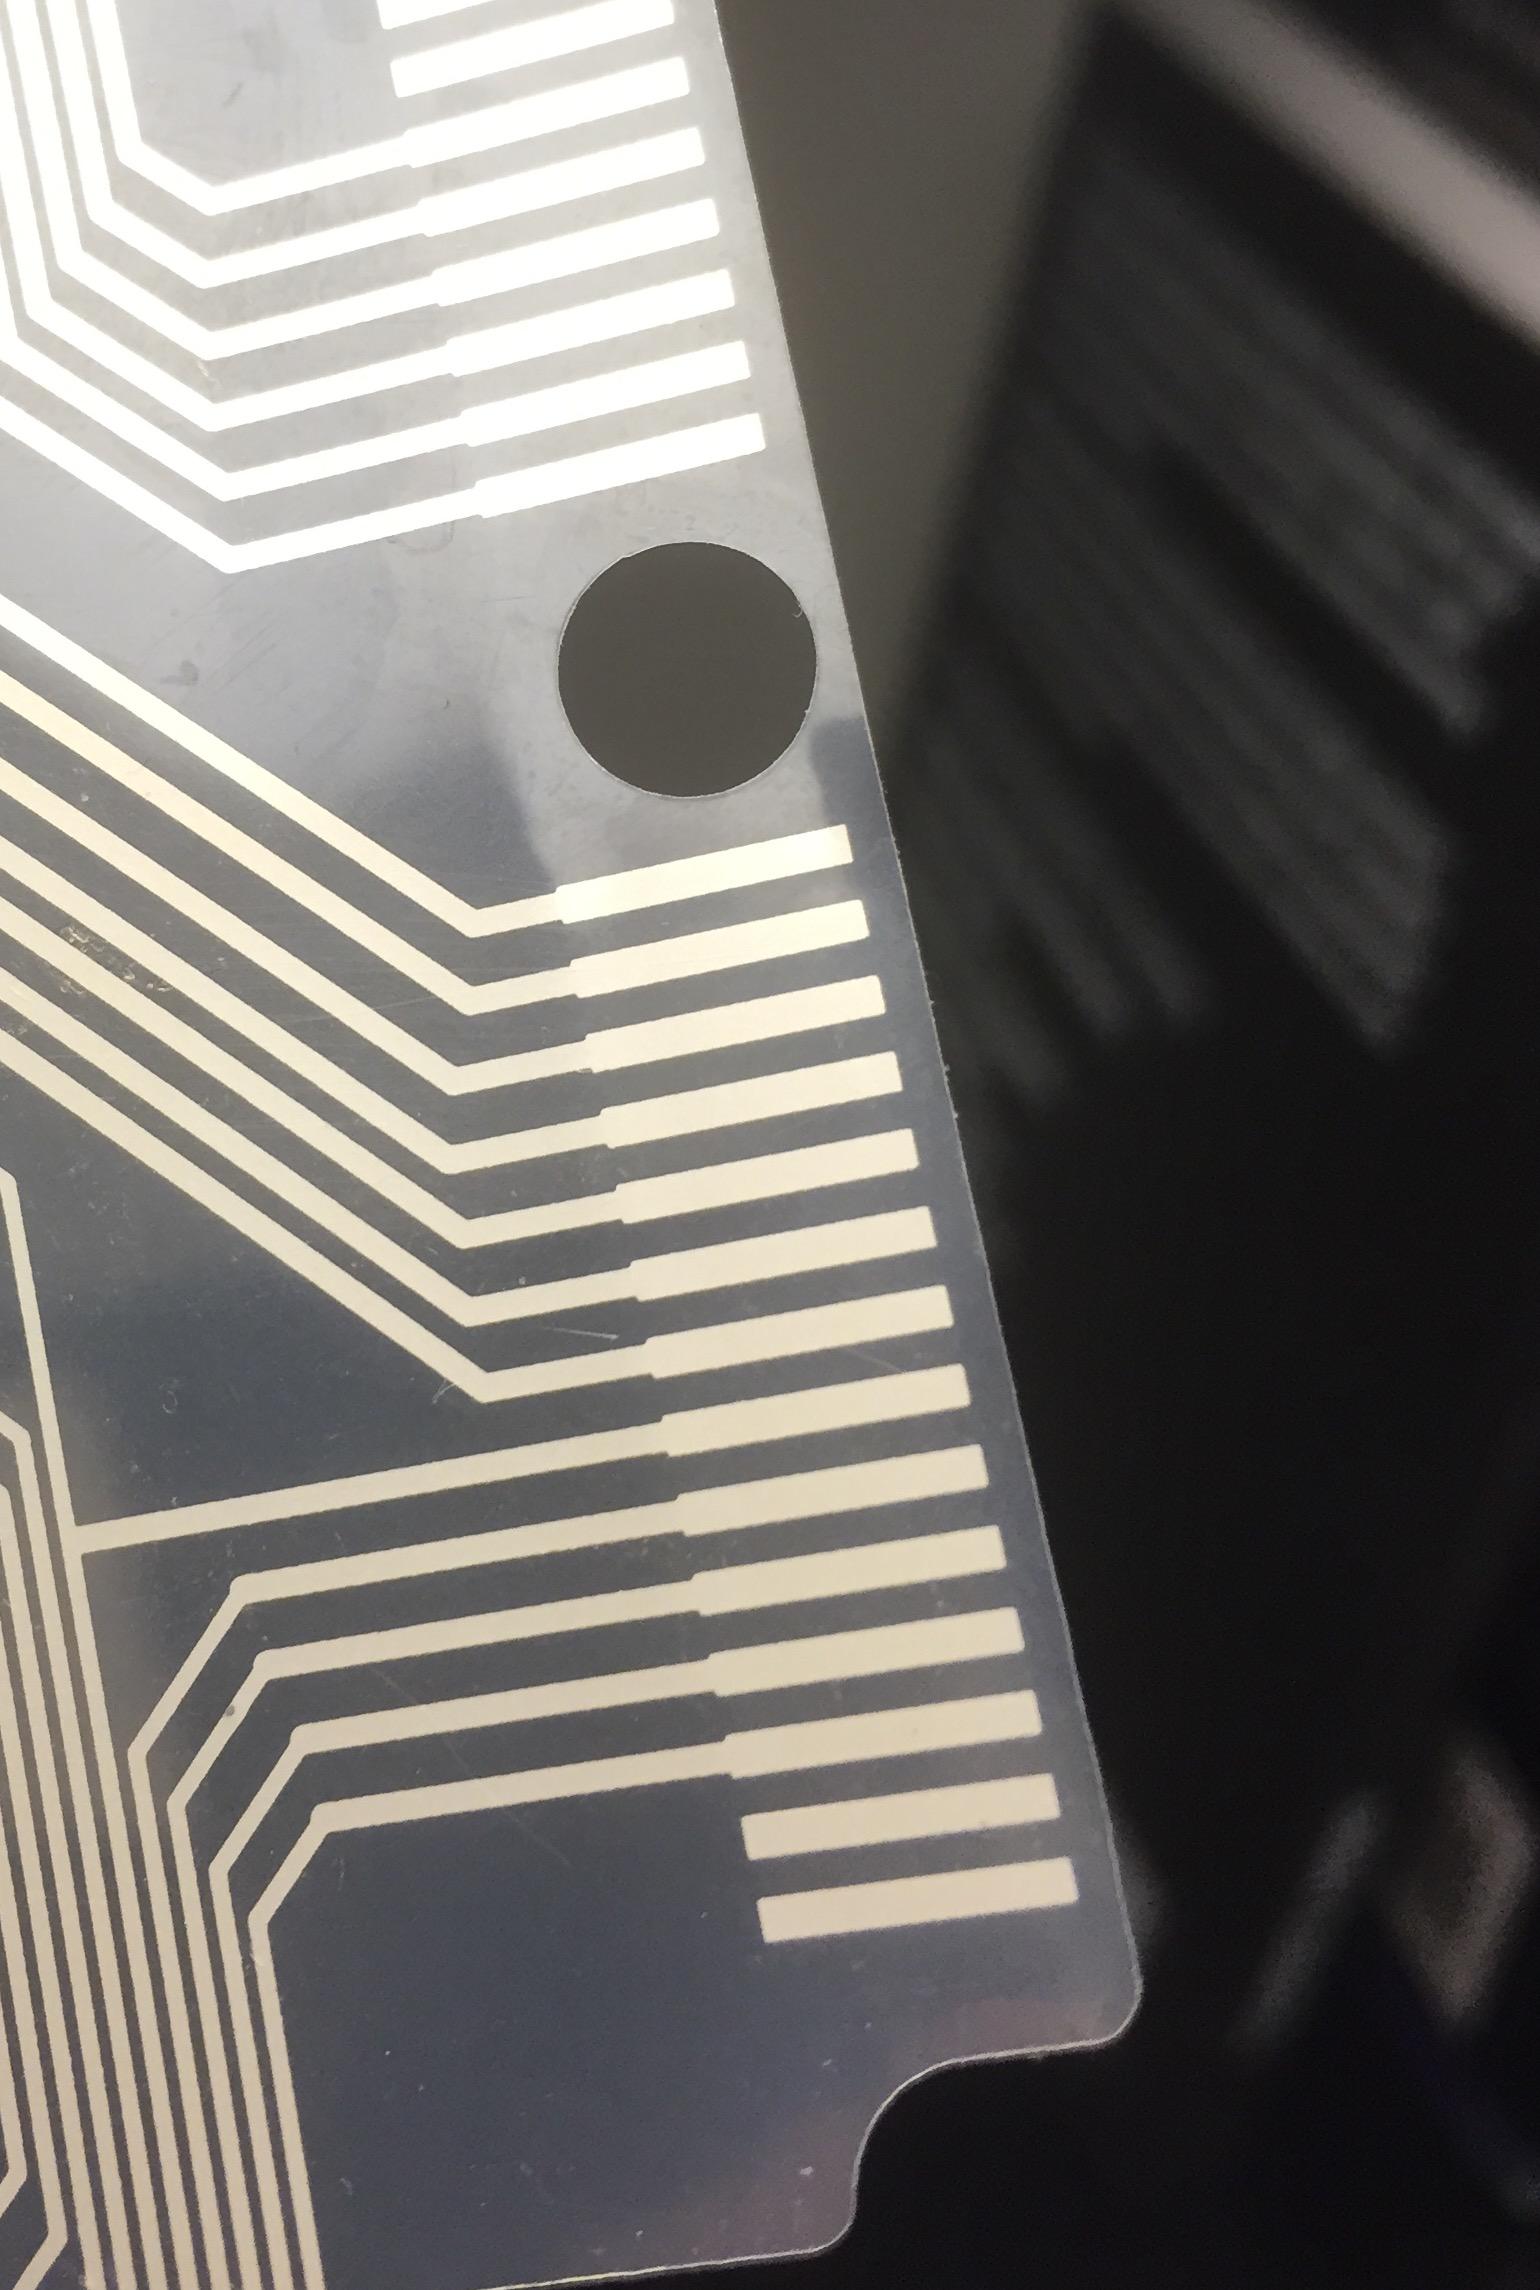 hight resolution of  plastic sheet taken from keyboard